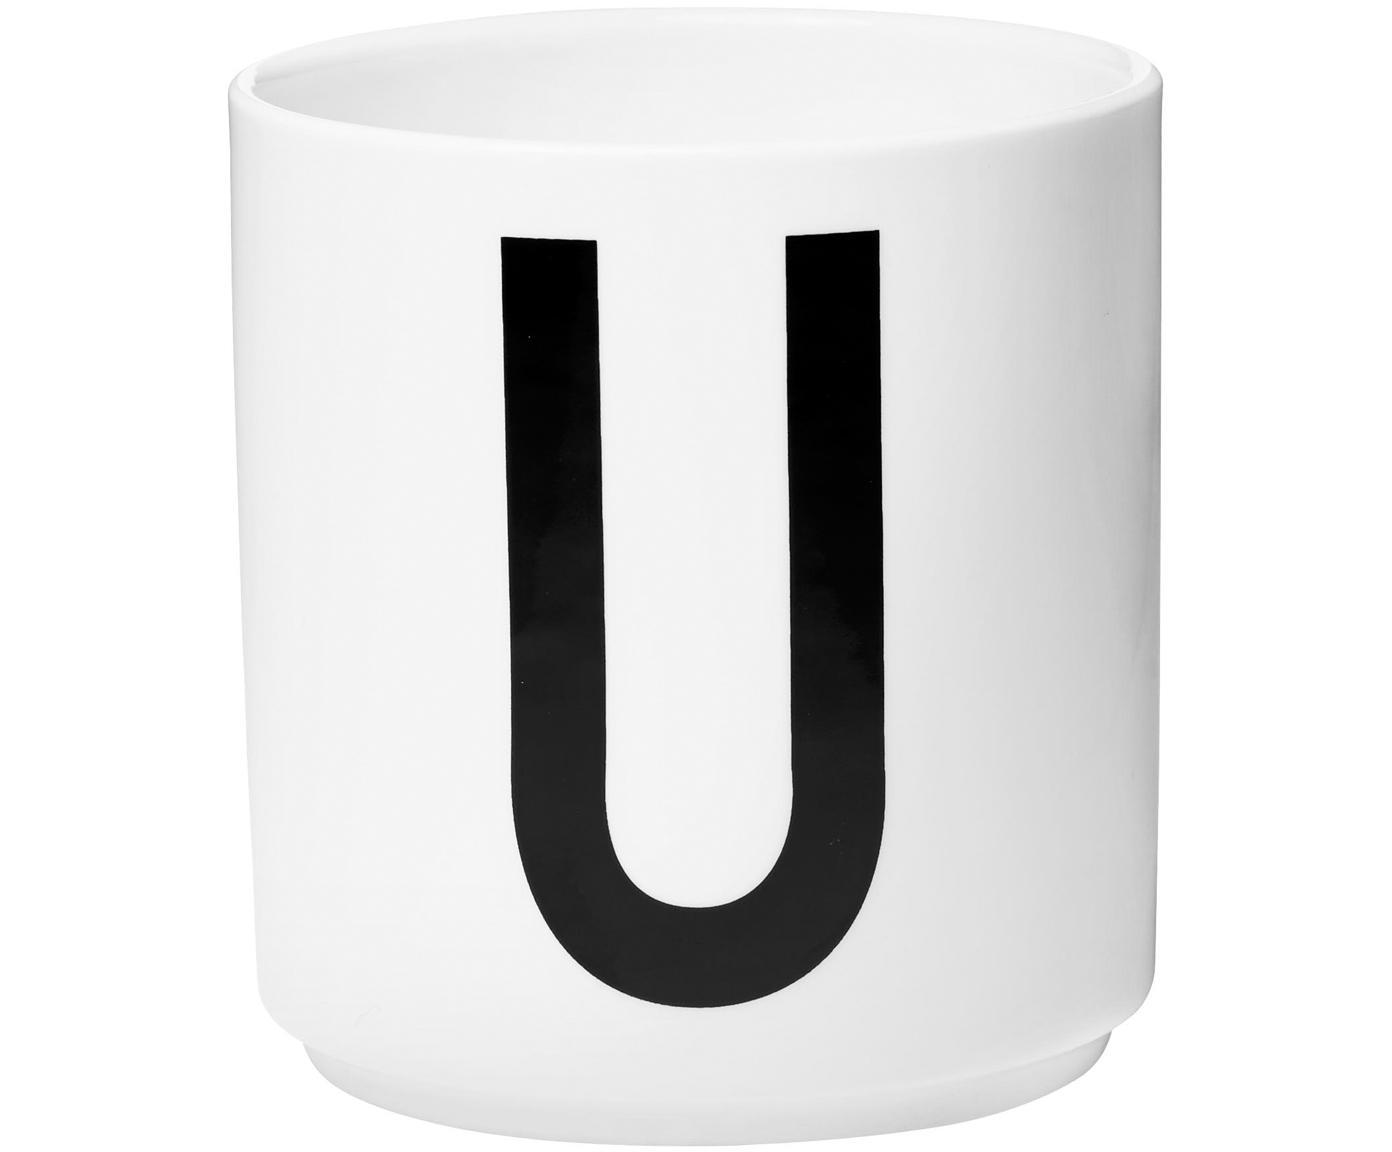 Design beker Personal met letters (varianten van A tot Z), Fine Bone China, porselein, Wit, zwart, Beker U